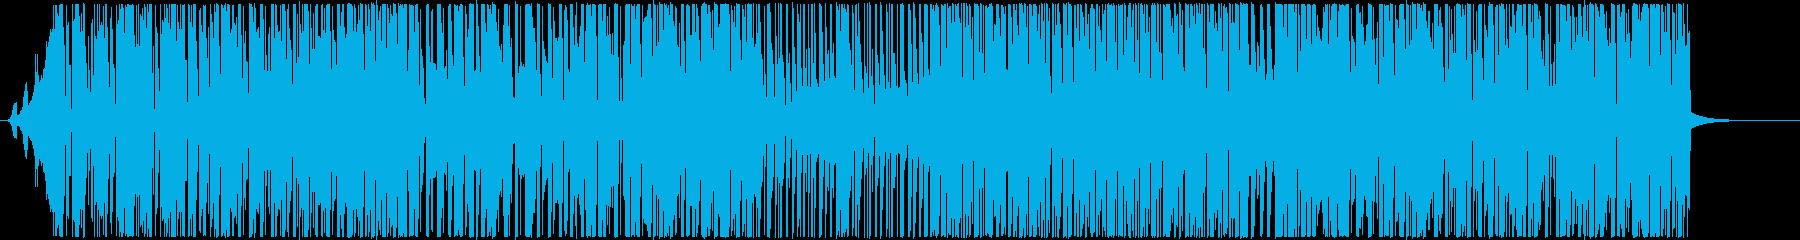 K-POP系ノリノリのビートPOPの再生済みの波形